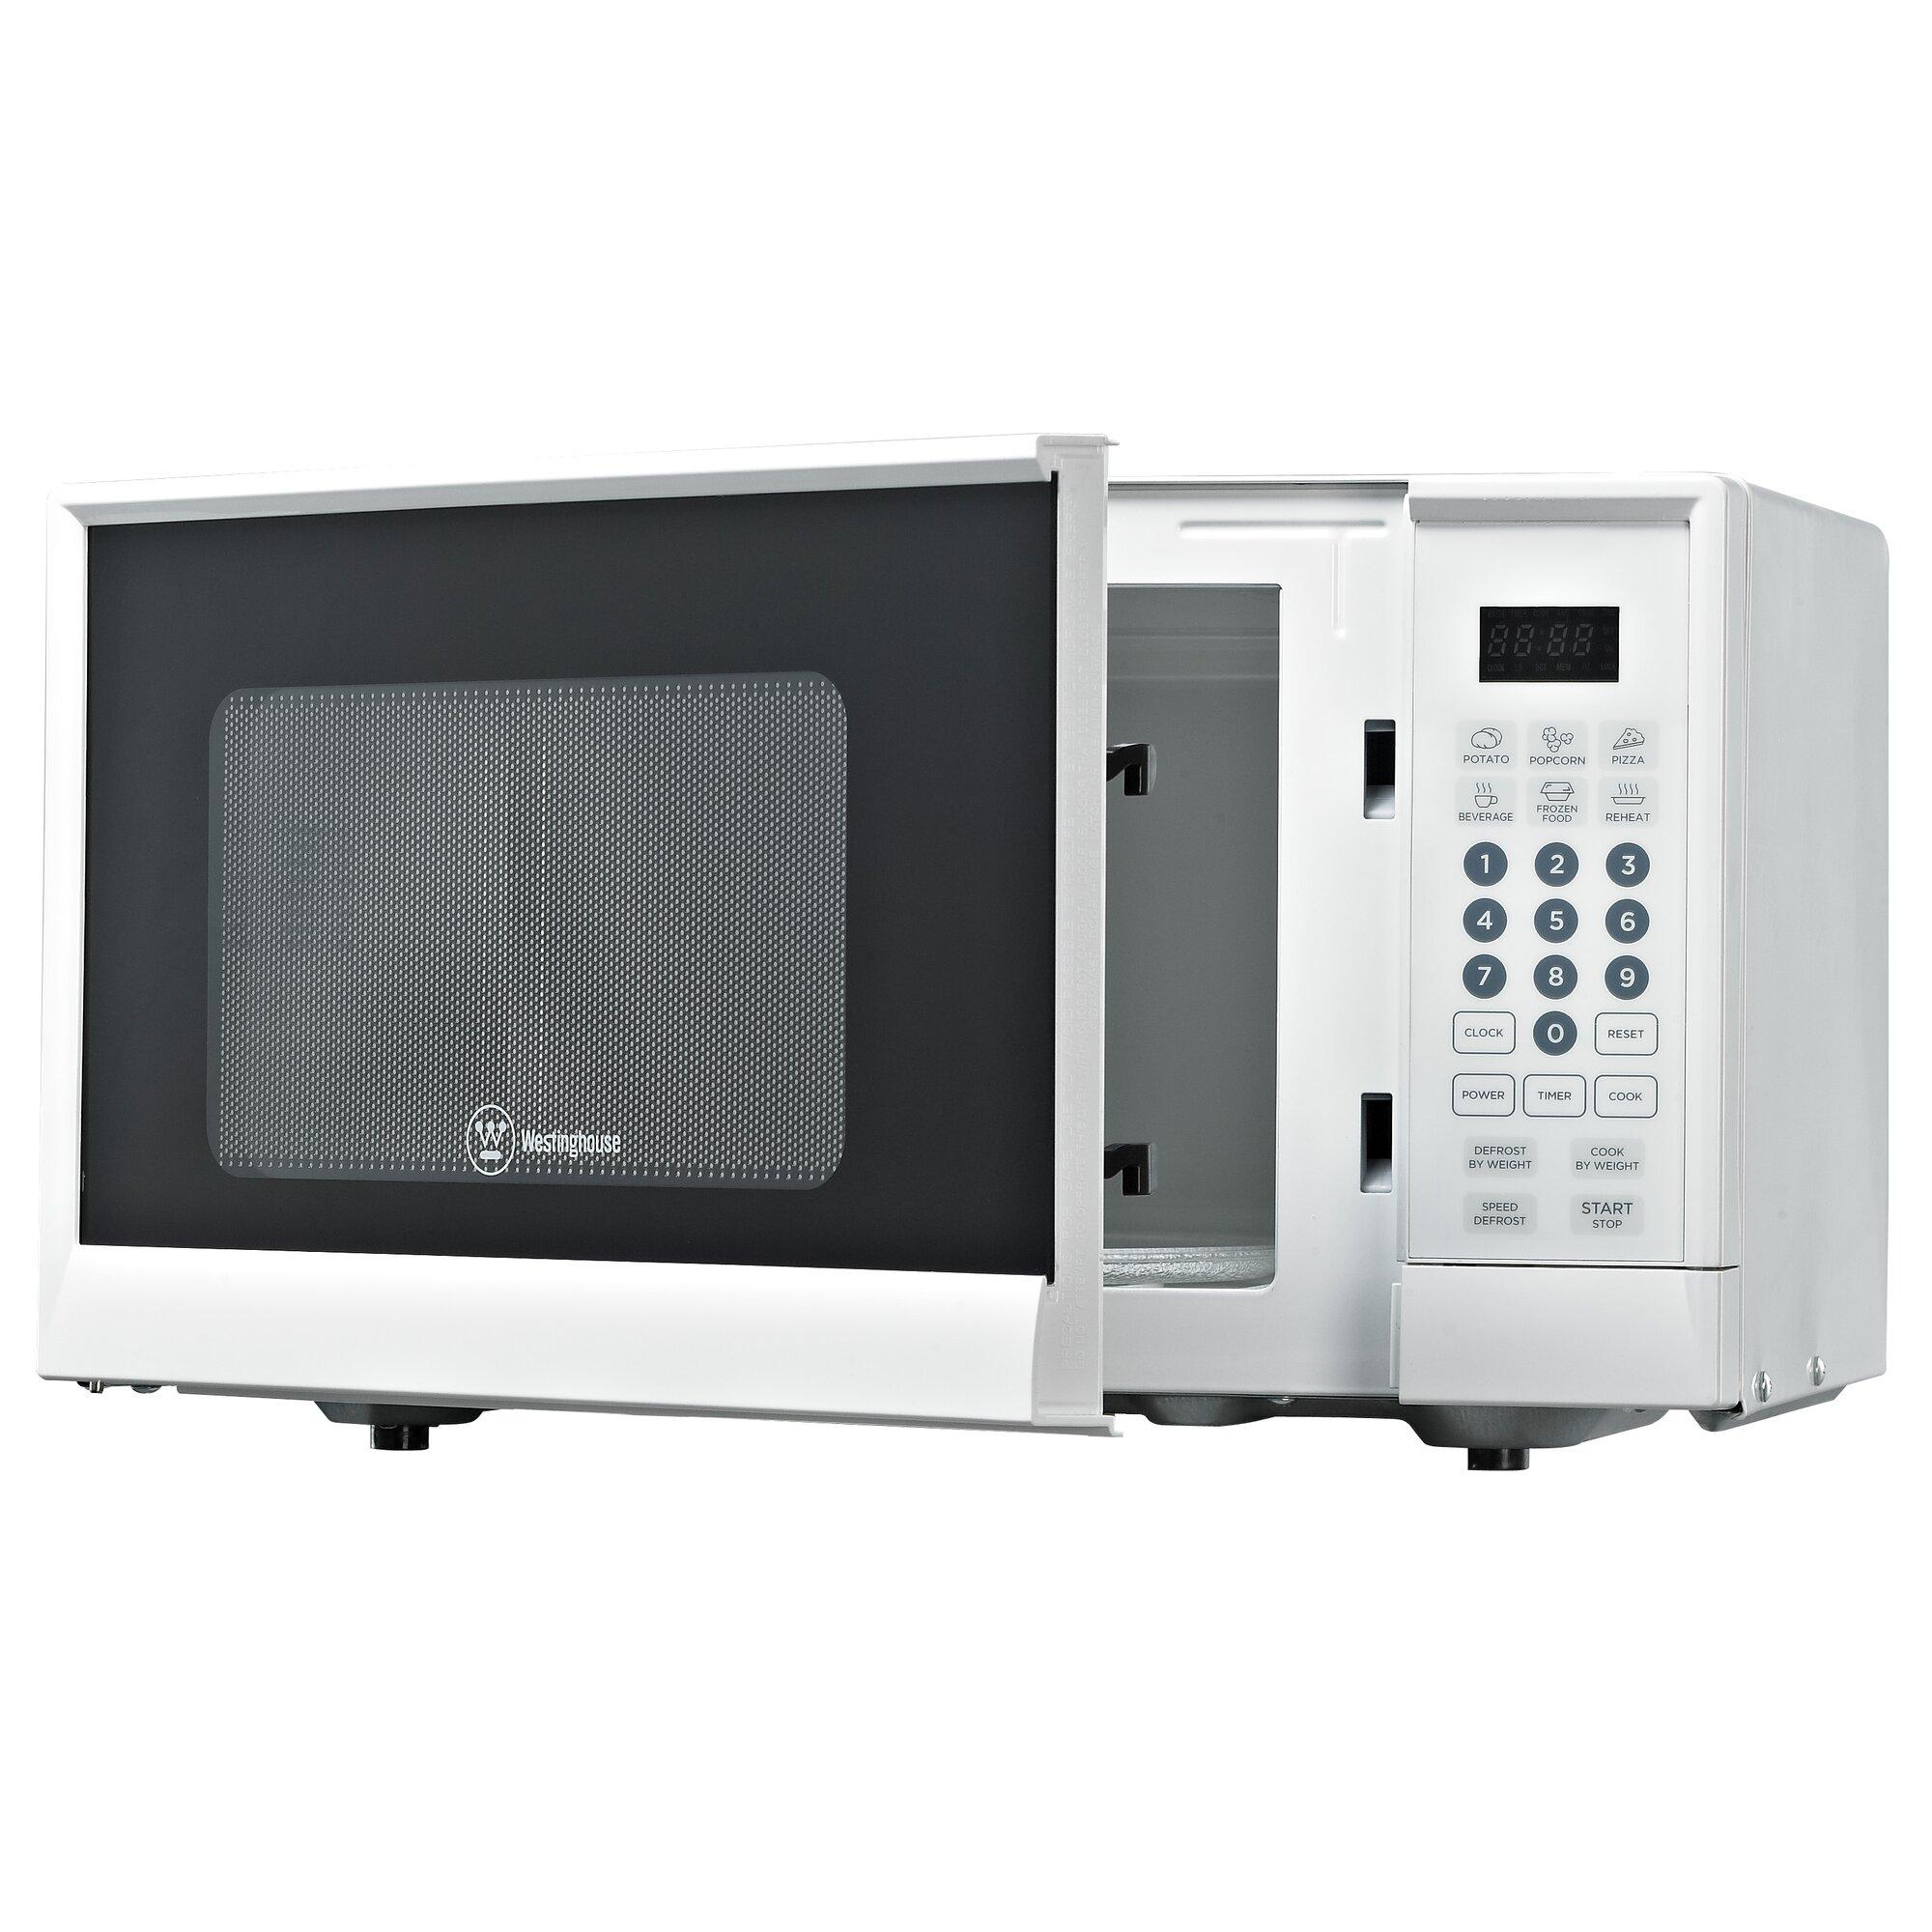 Countertop Microwave Walmart Canada : ... 19